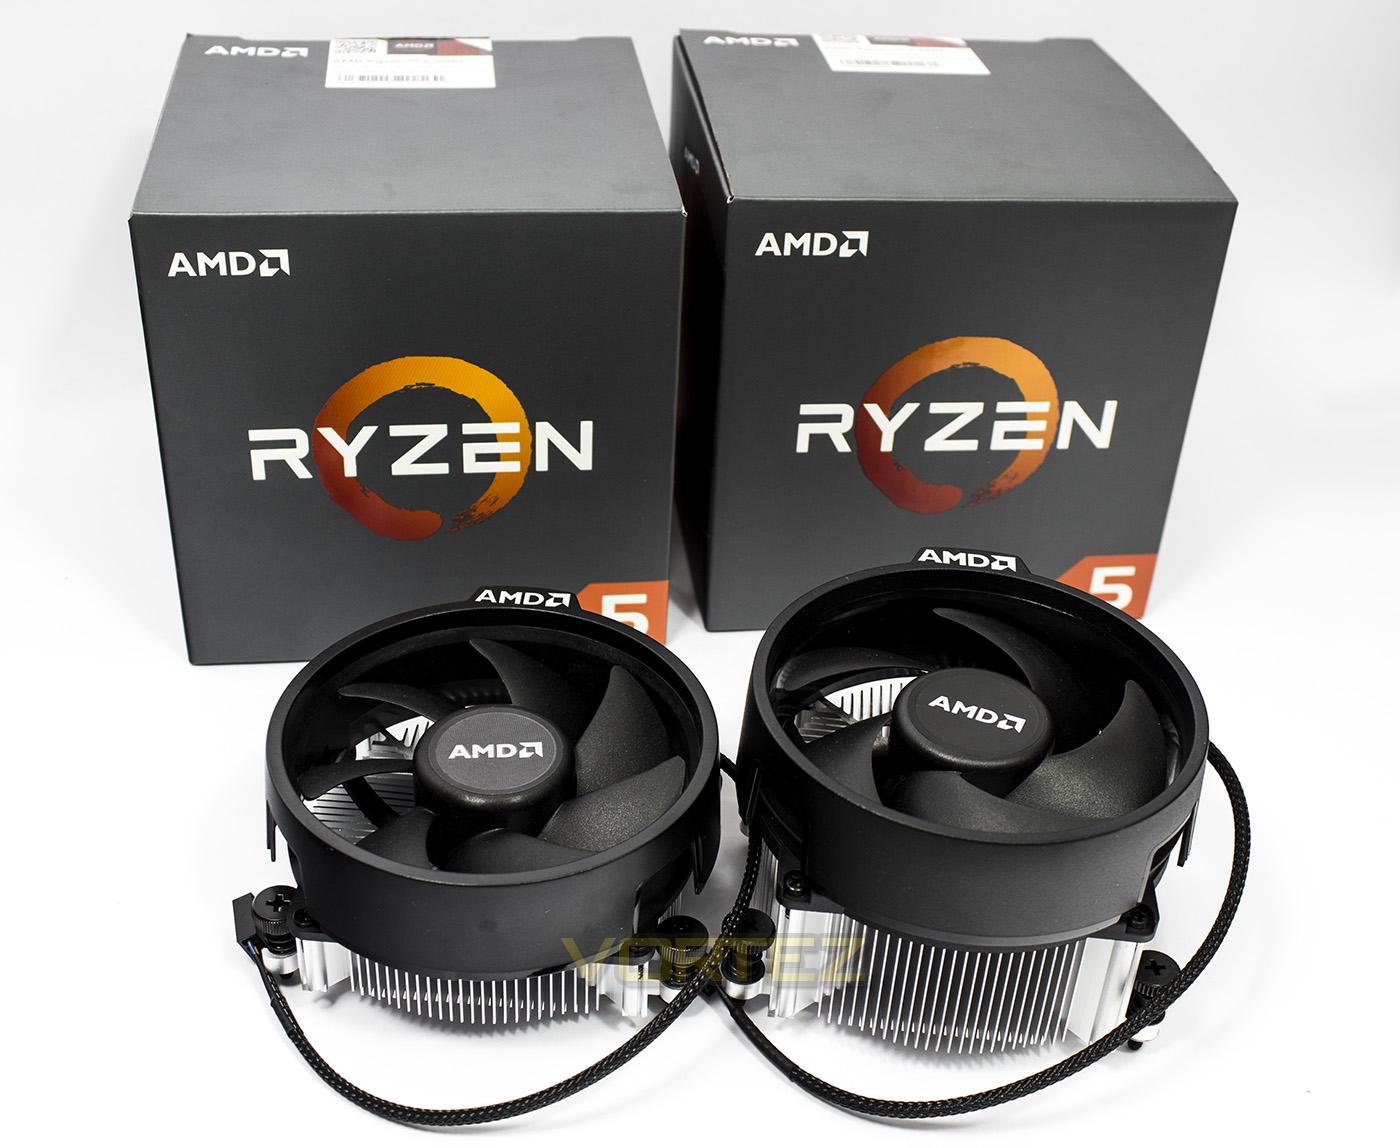 Amd Ryzen 5 1400 1600 Review Temperatures Overclocking